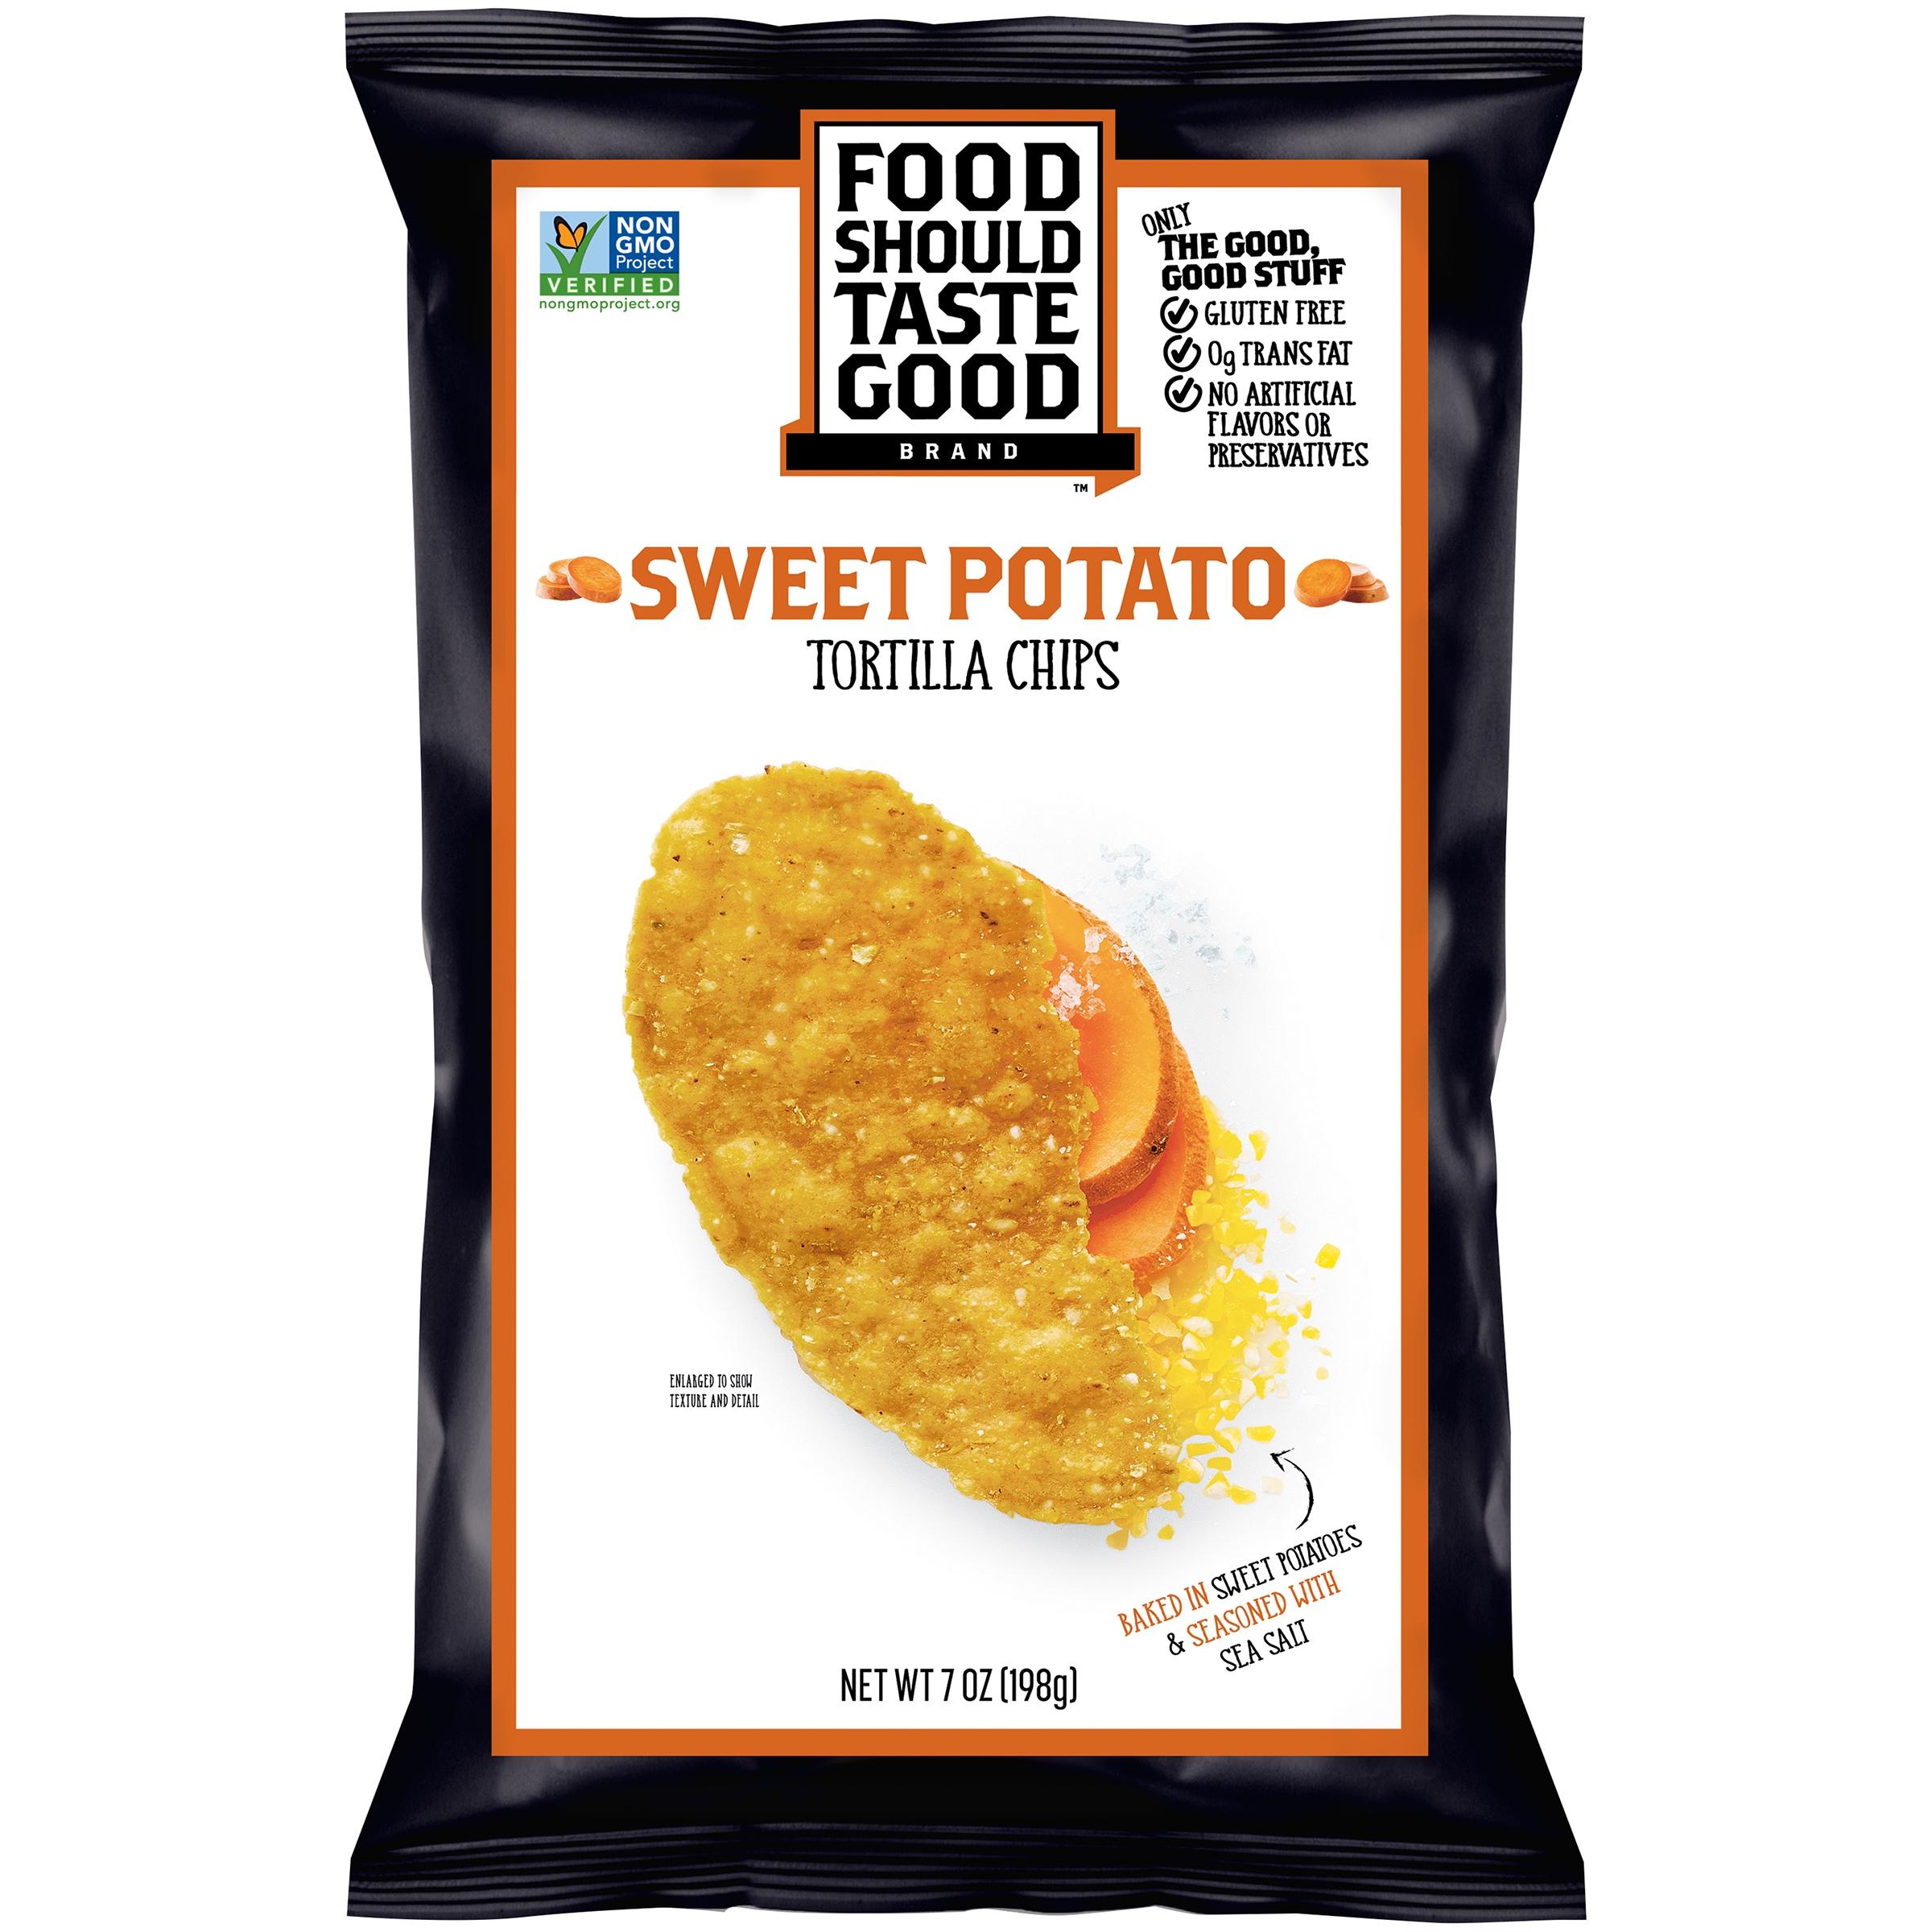 Food Should Taste Good Sweet Potato Tortilla Chips 7 oz. Bag by Food Should Taste Good, Inc.